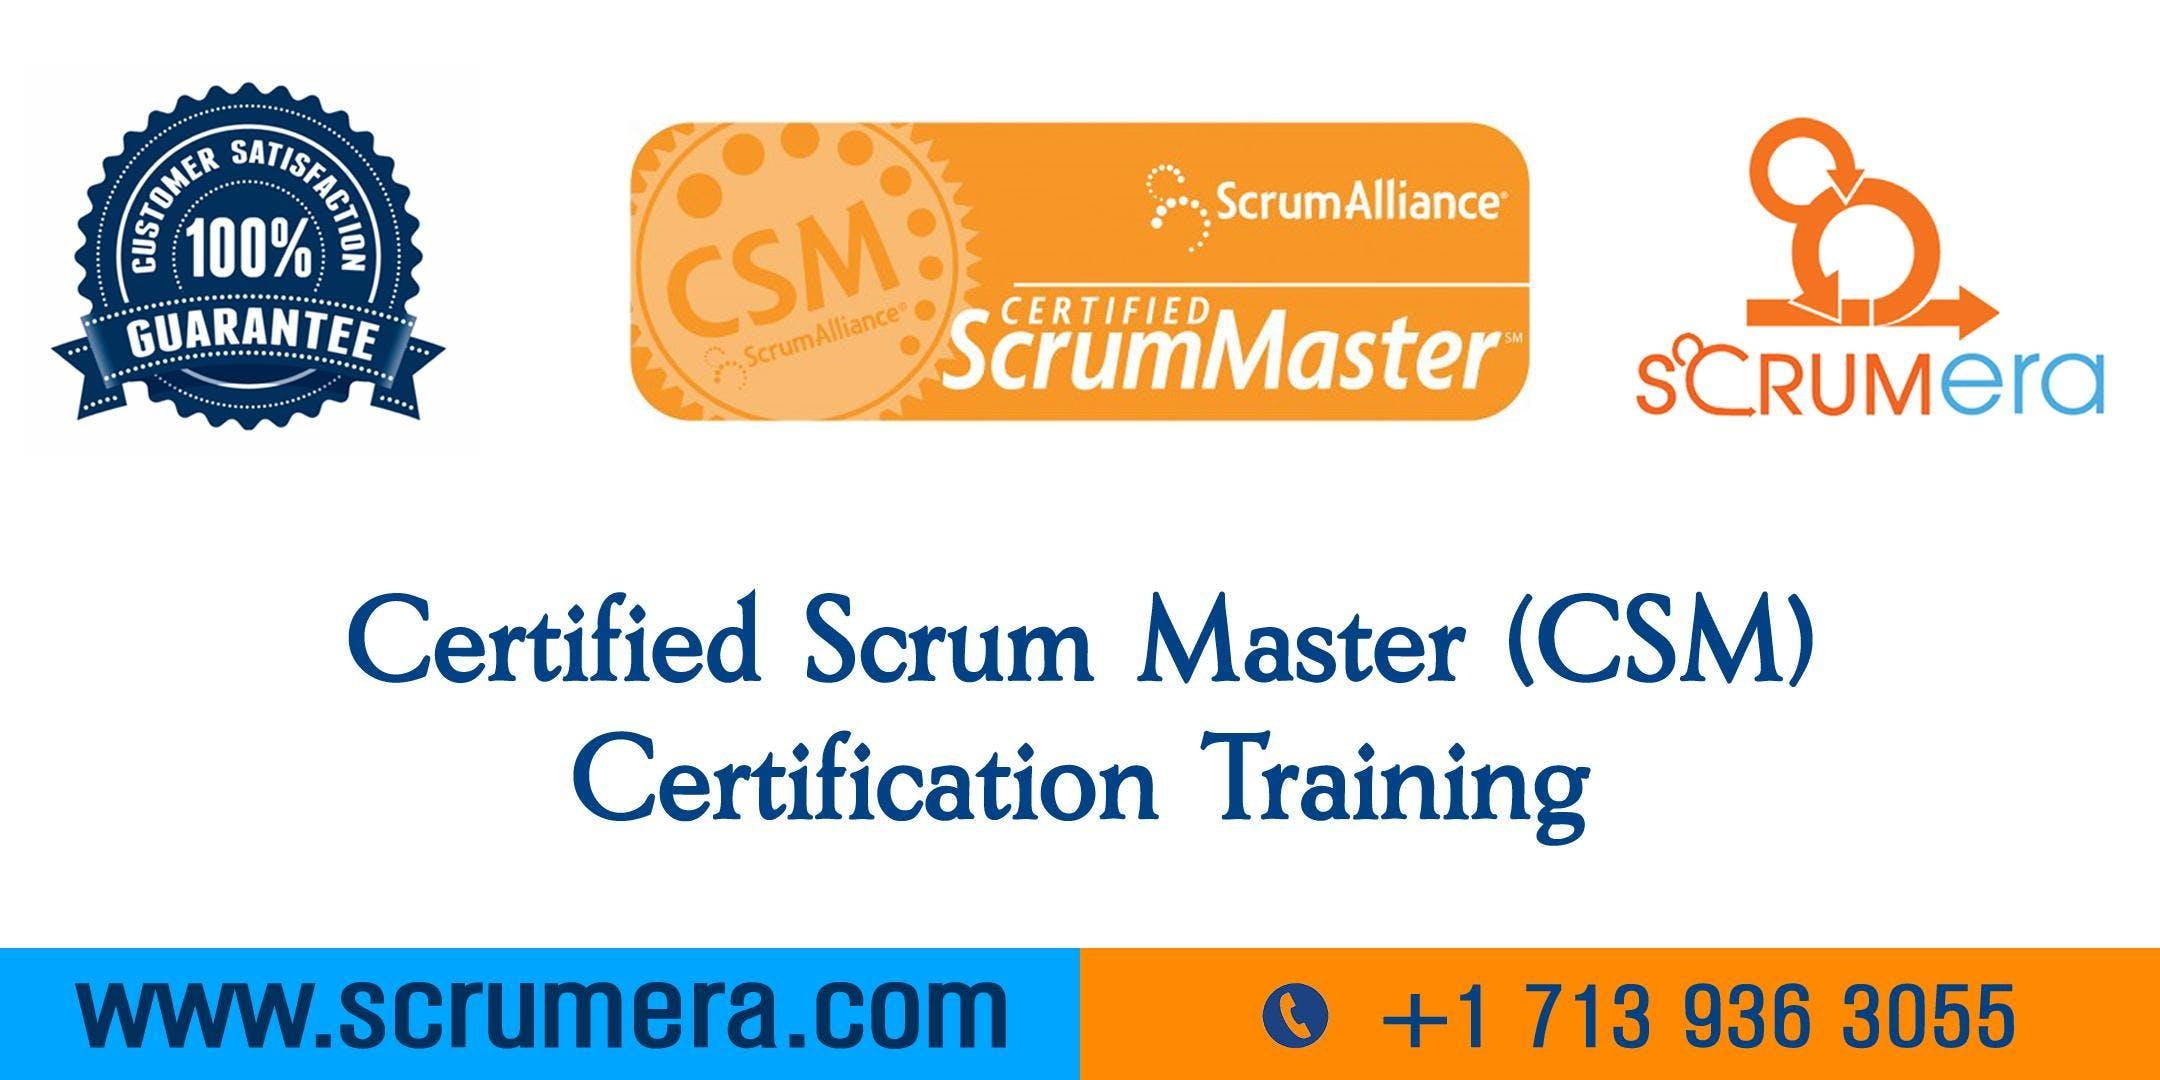 Scrum Master Certification   CSM Training   CSM Certification Workshop   Certified Scrum Master (CSM) Training in New York, NY   ScrumERA